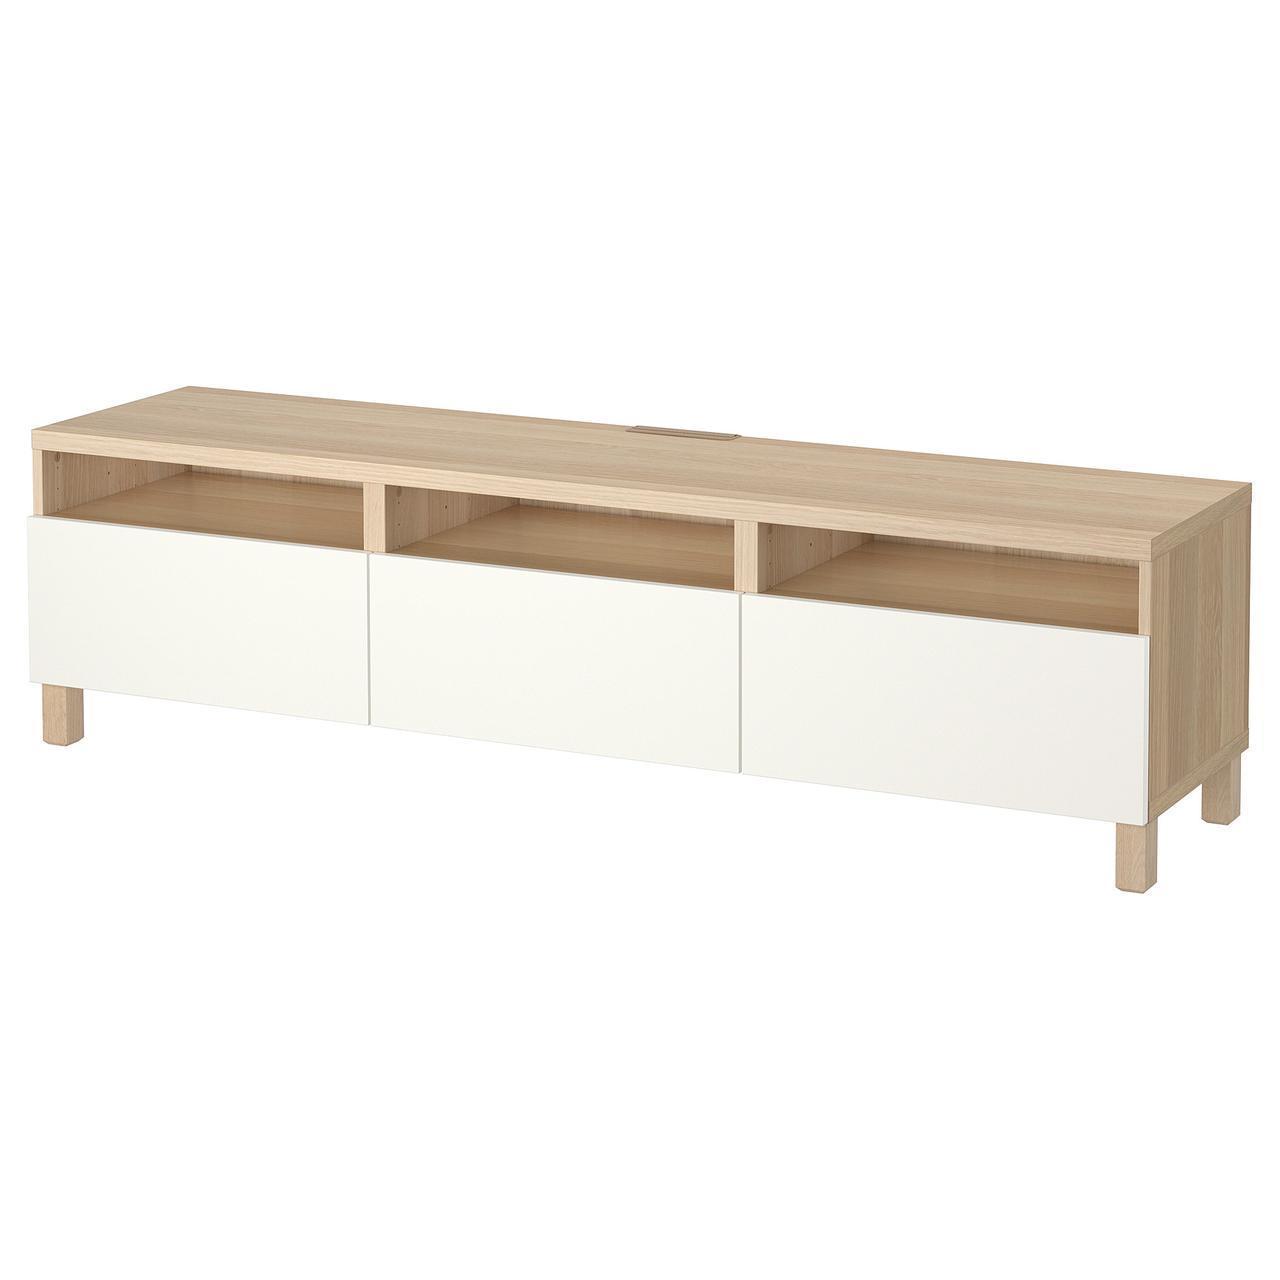 IKEA BESTA Тумба под телевизор с ящиками, белый дуб, Лаппвикен белый  (591.930.11)